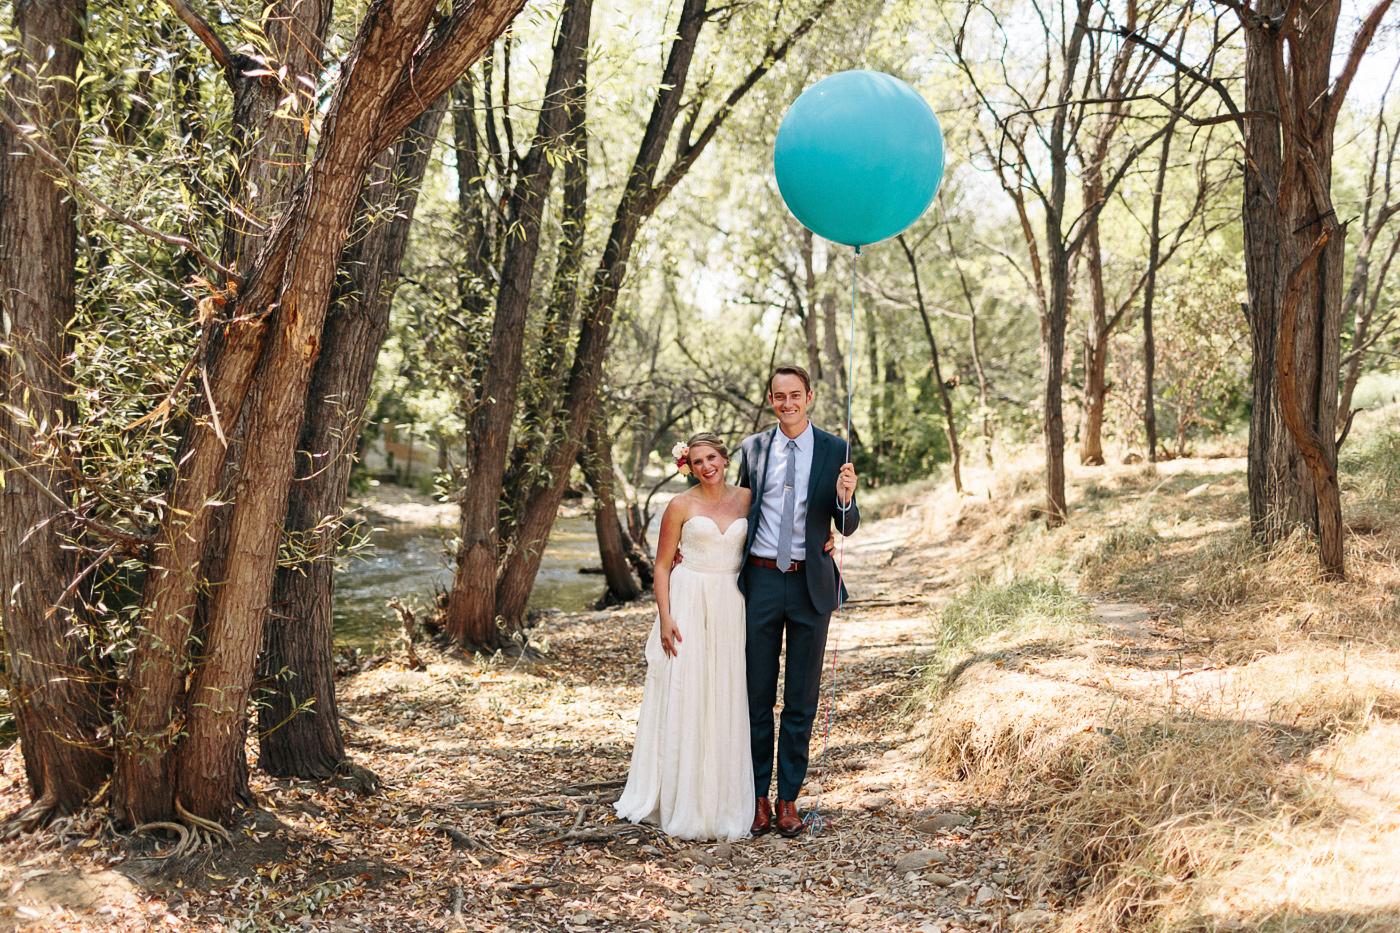 105-lyons-farmette-wedding-photographer-lucy-austin-flash-mob-dance.jpg